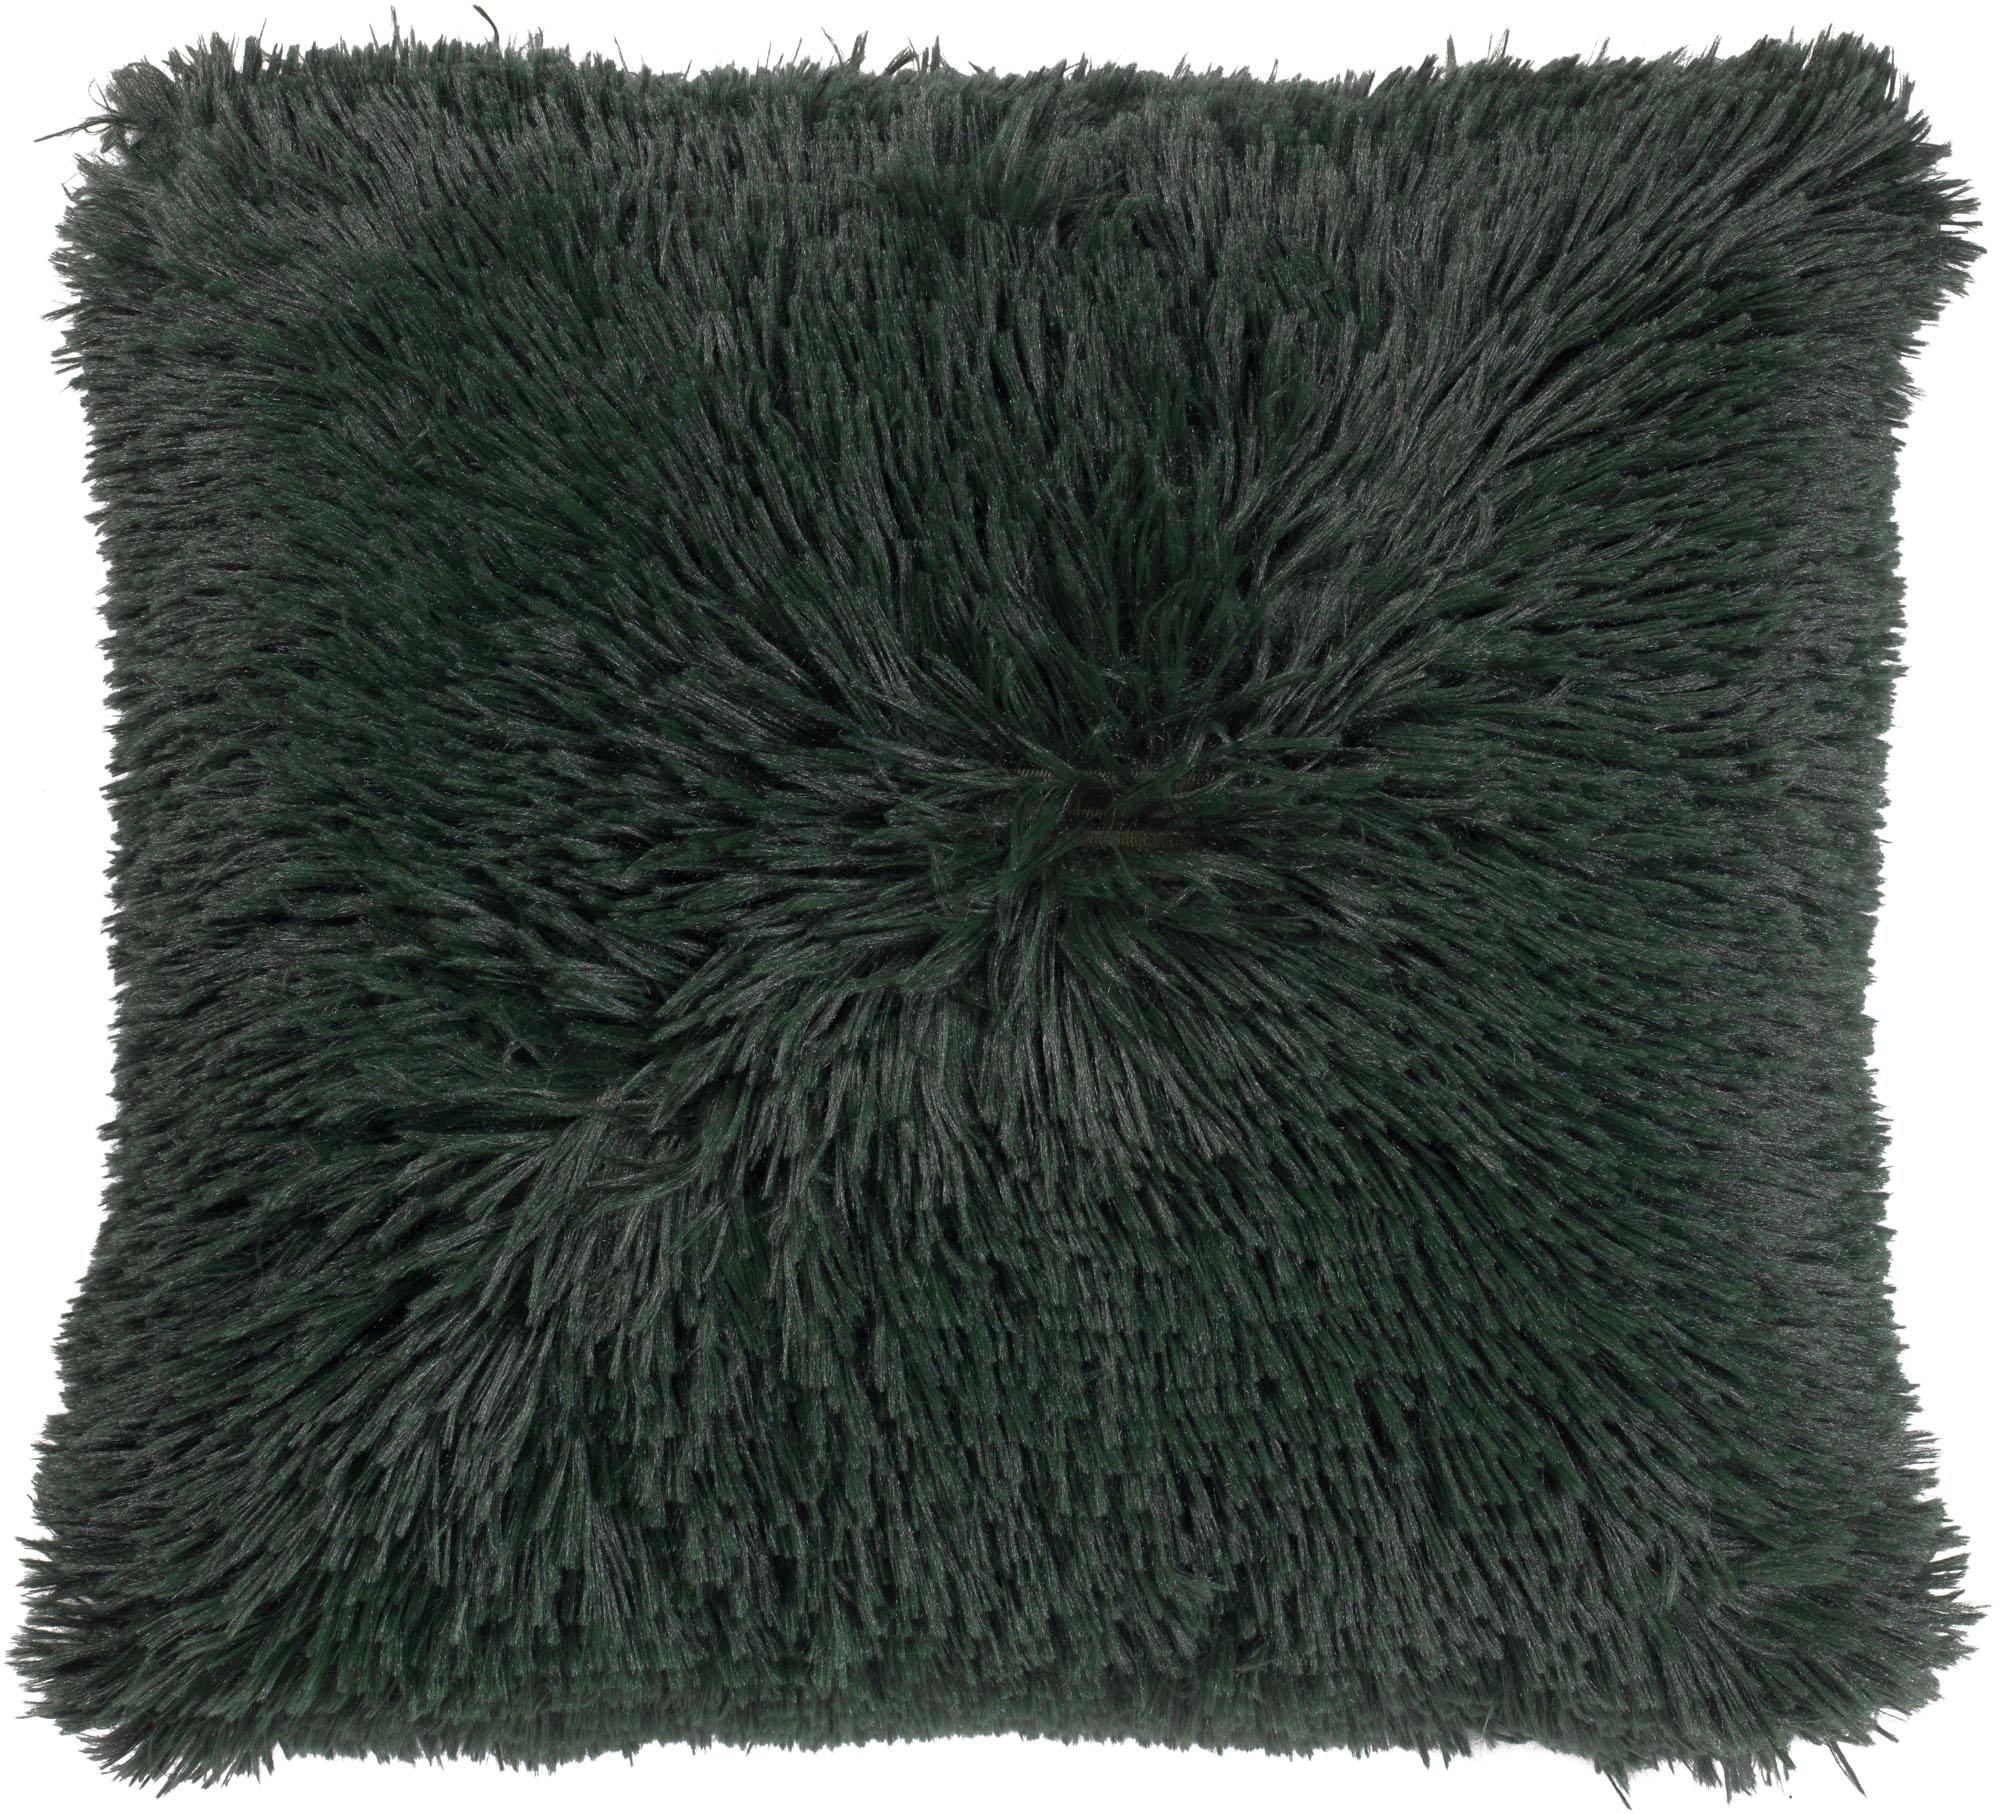 FLUFFY - Sierkussen unikleur Mountain View 60x60 cm